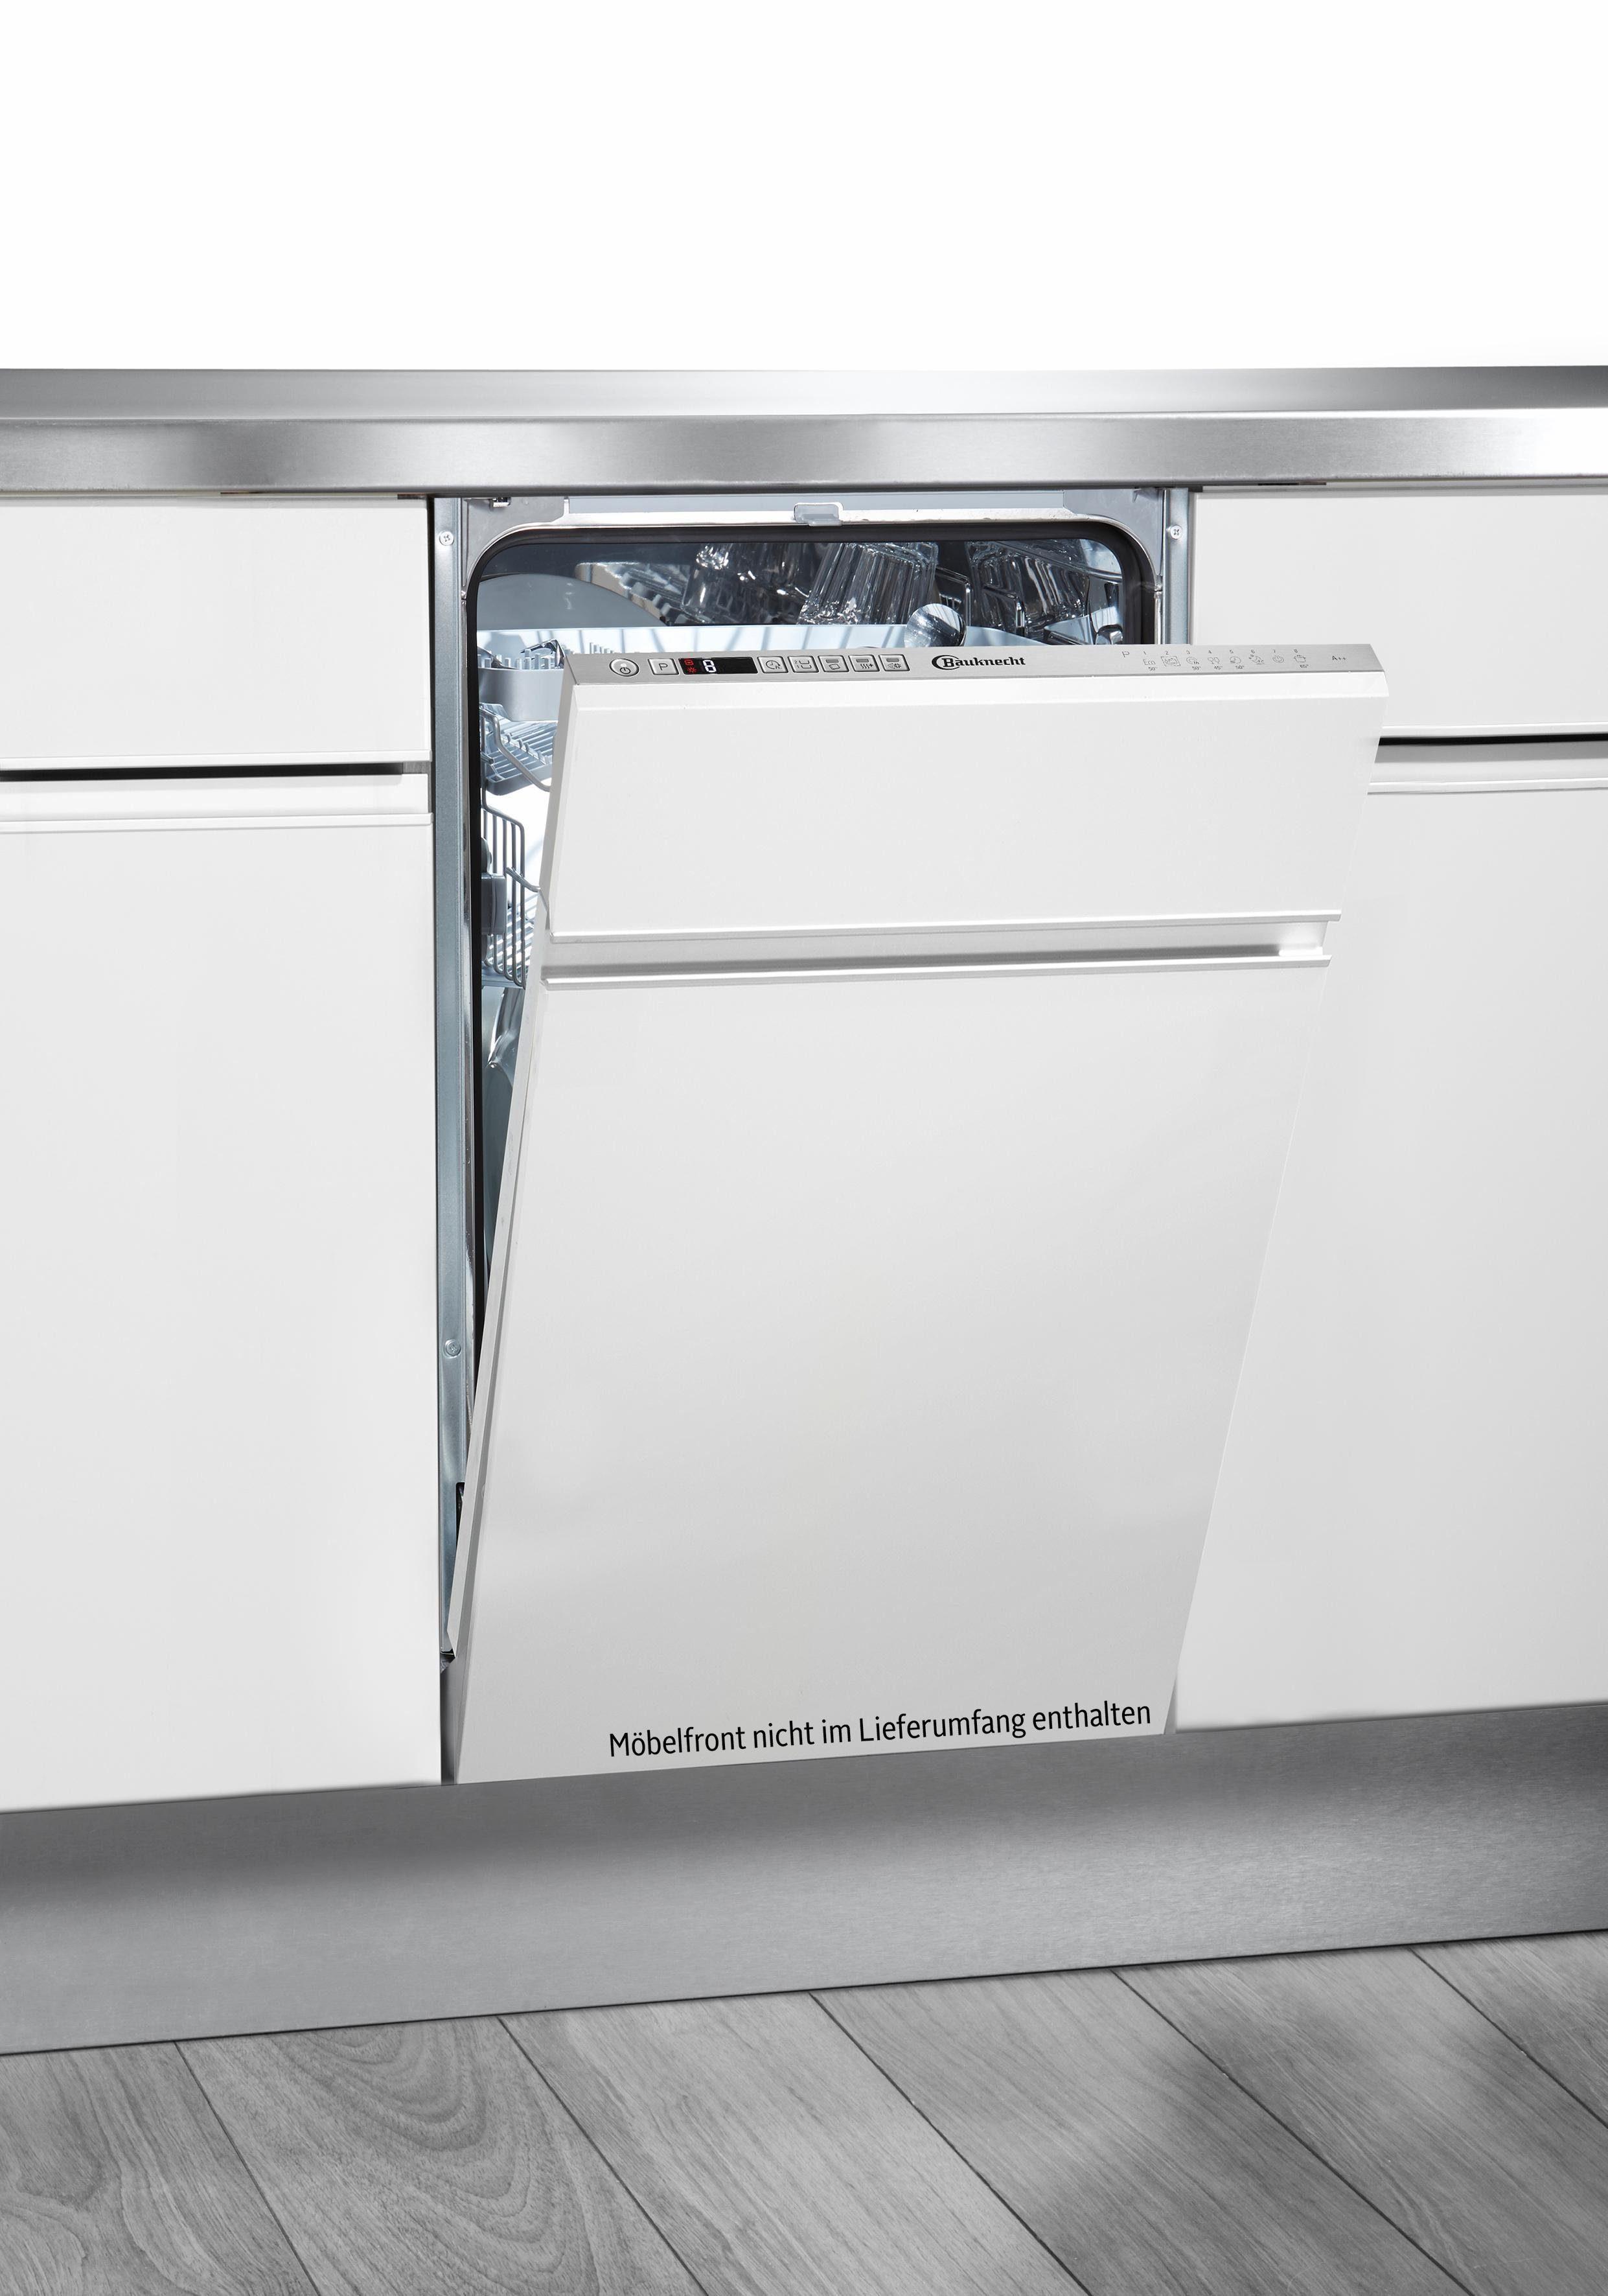 BAUKNECHT vollintegrierbarer Geschirrspüler, GCX 825, 9 l, 10 Maßgedecke, Energieeffizienzklasse A++